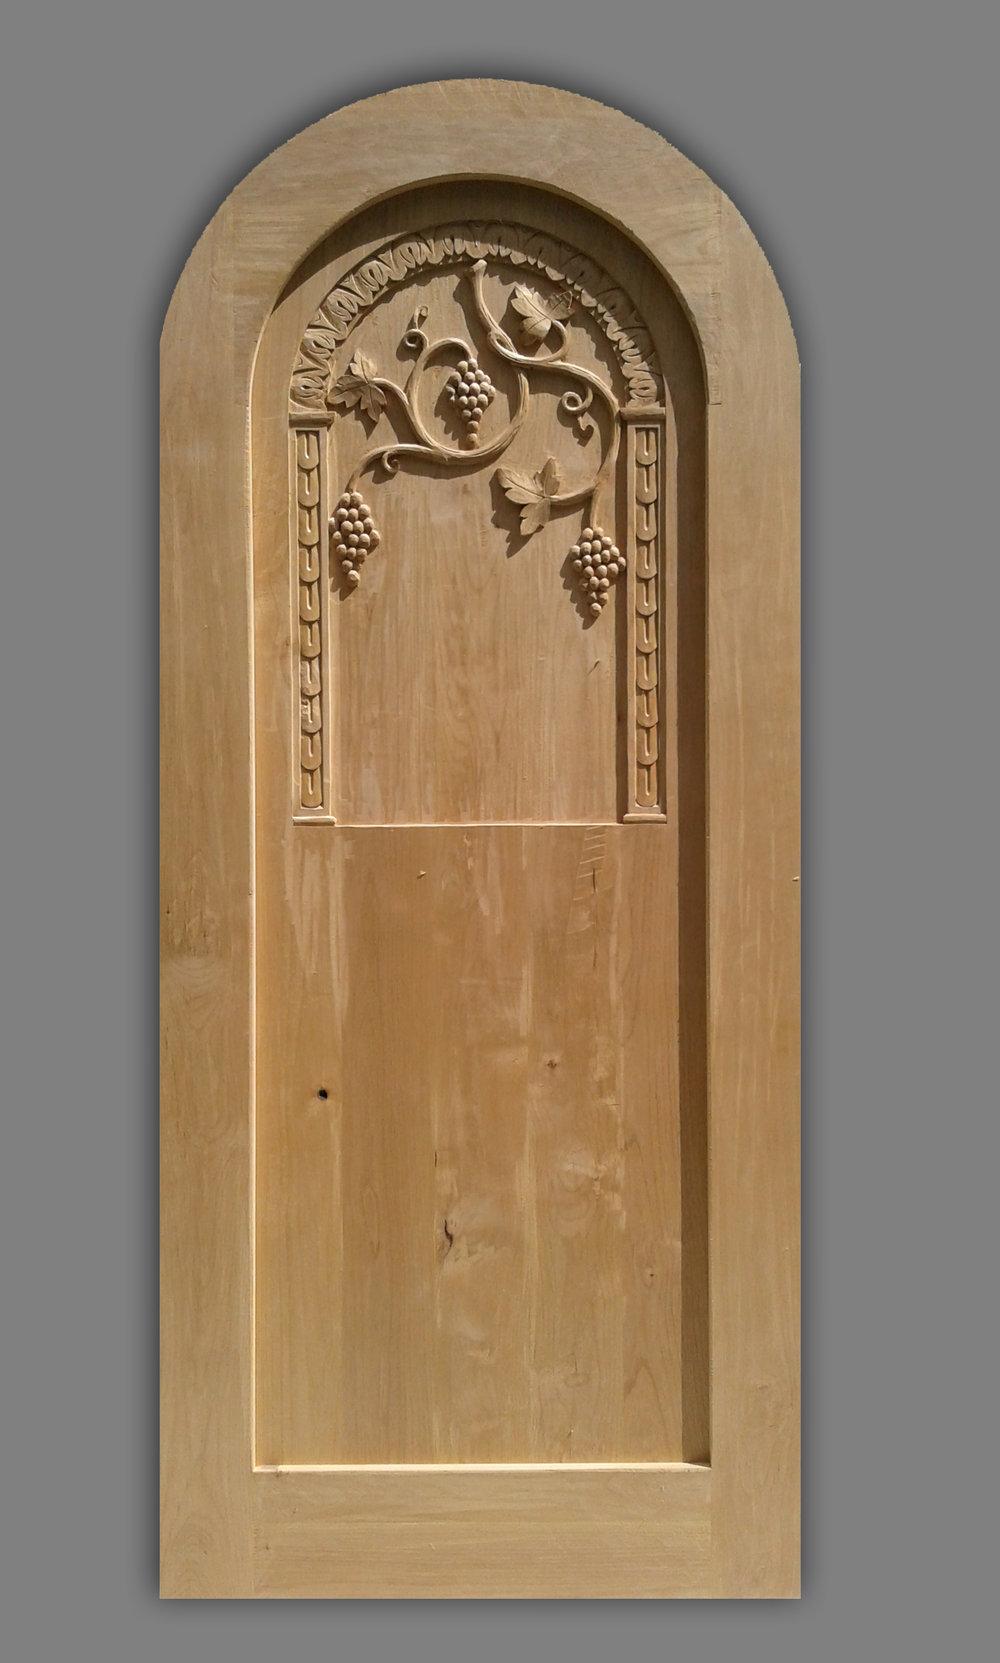 Florence, carved wood wine cellar door.